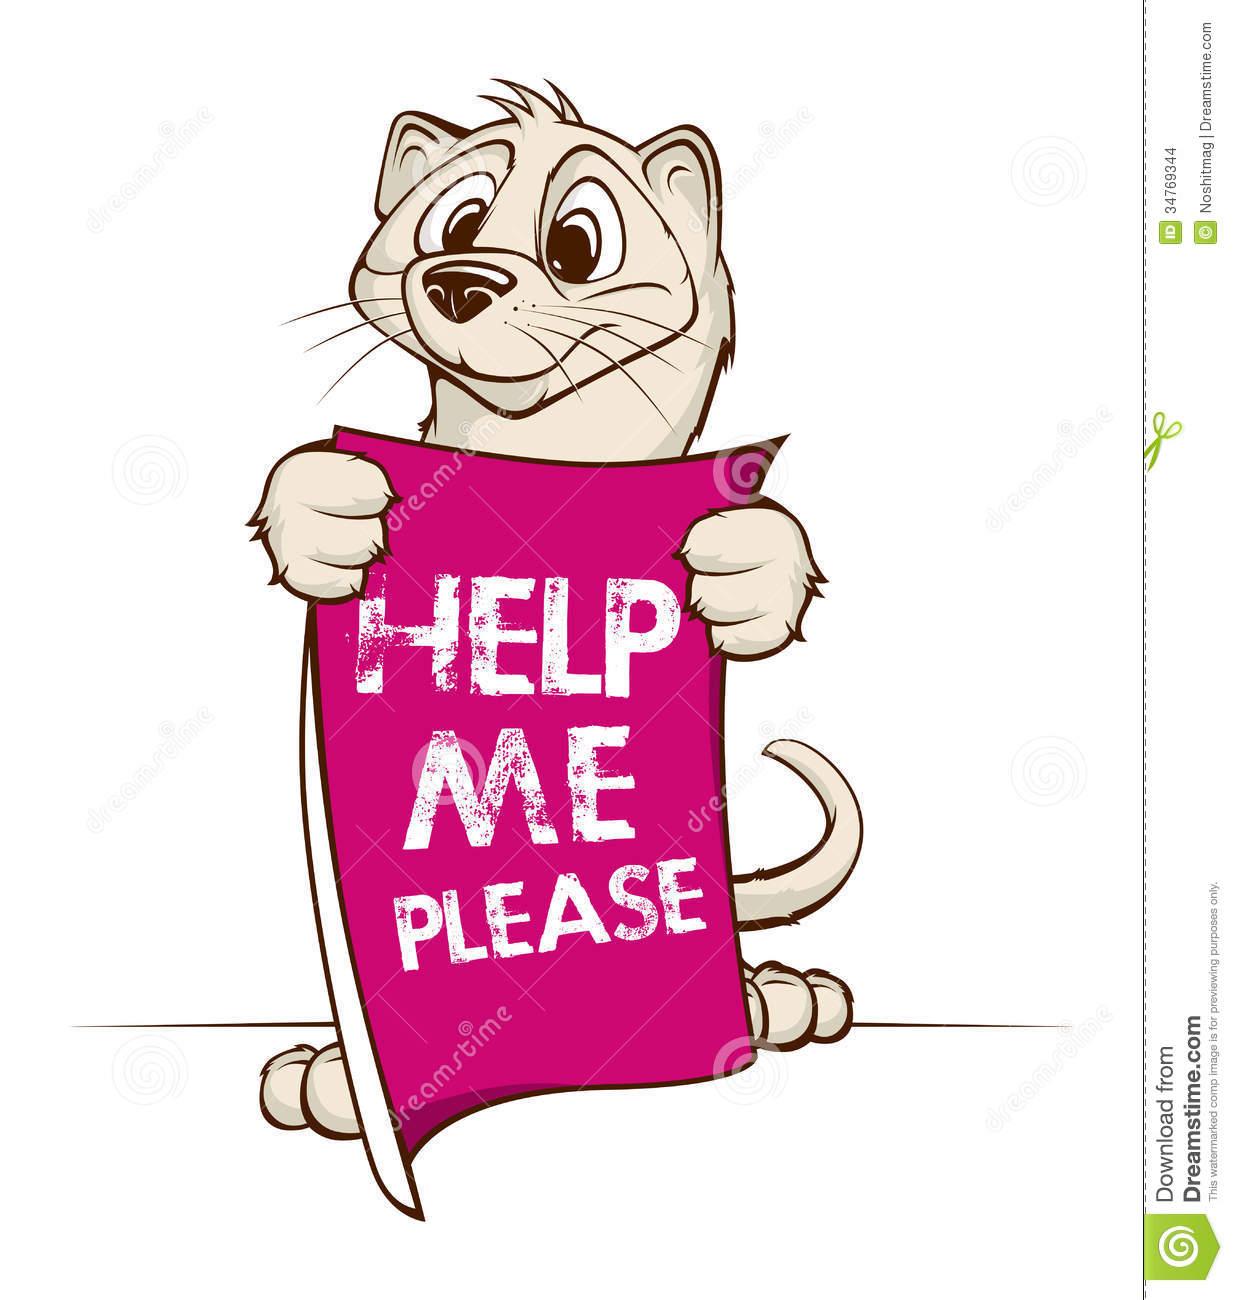 PLEASE HELP ME!!!!!!!!!!!!!!!!!!!!!?